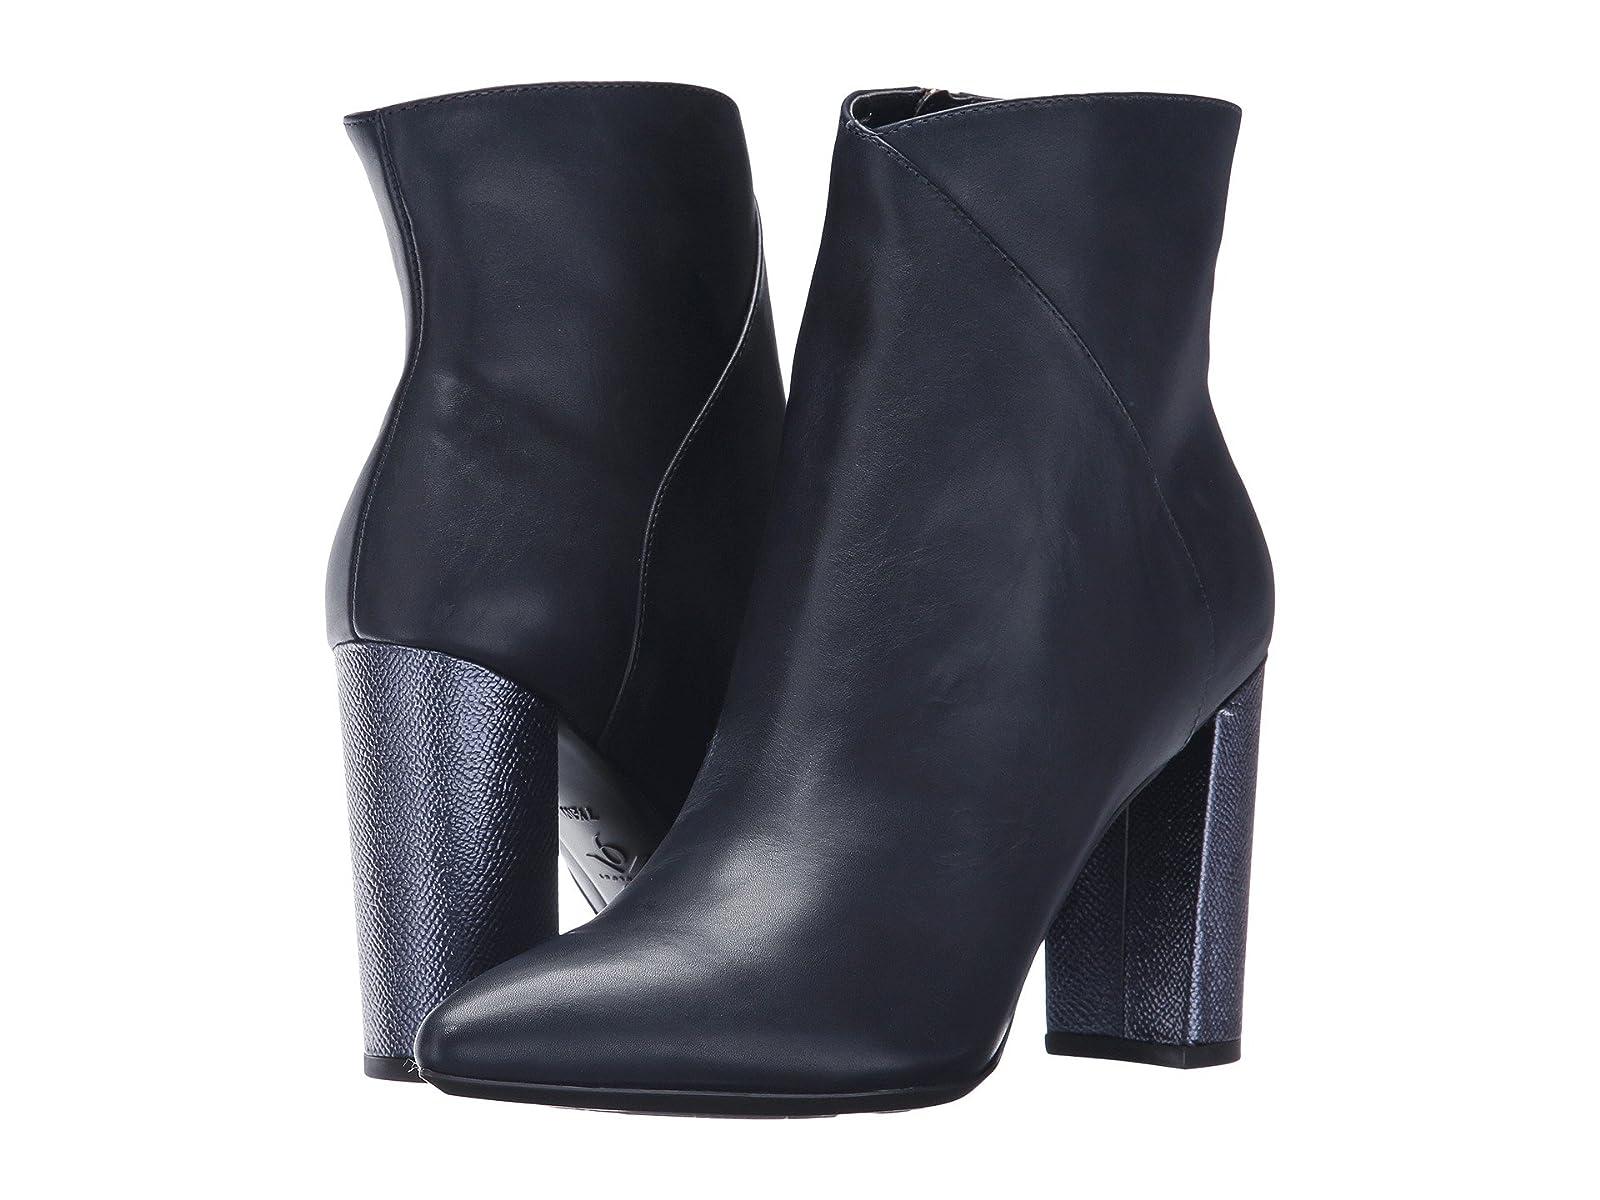 Nine West ArgyleCheap and distinctive eye-catching shoes